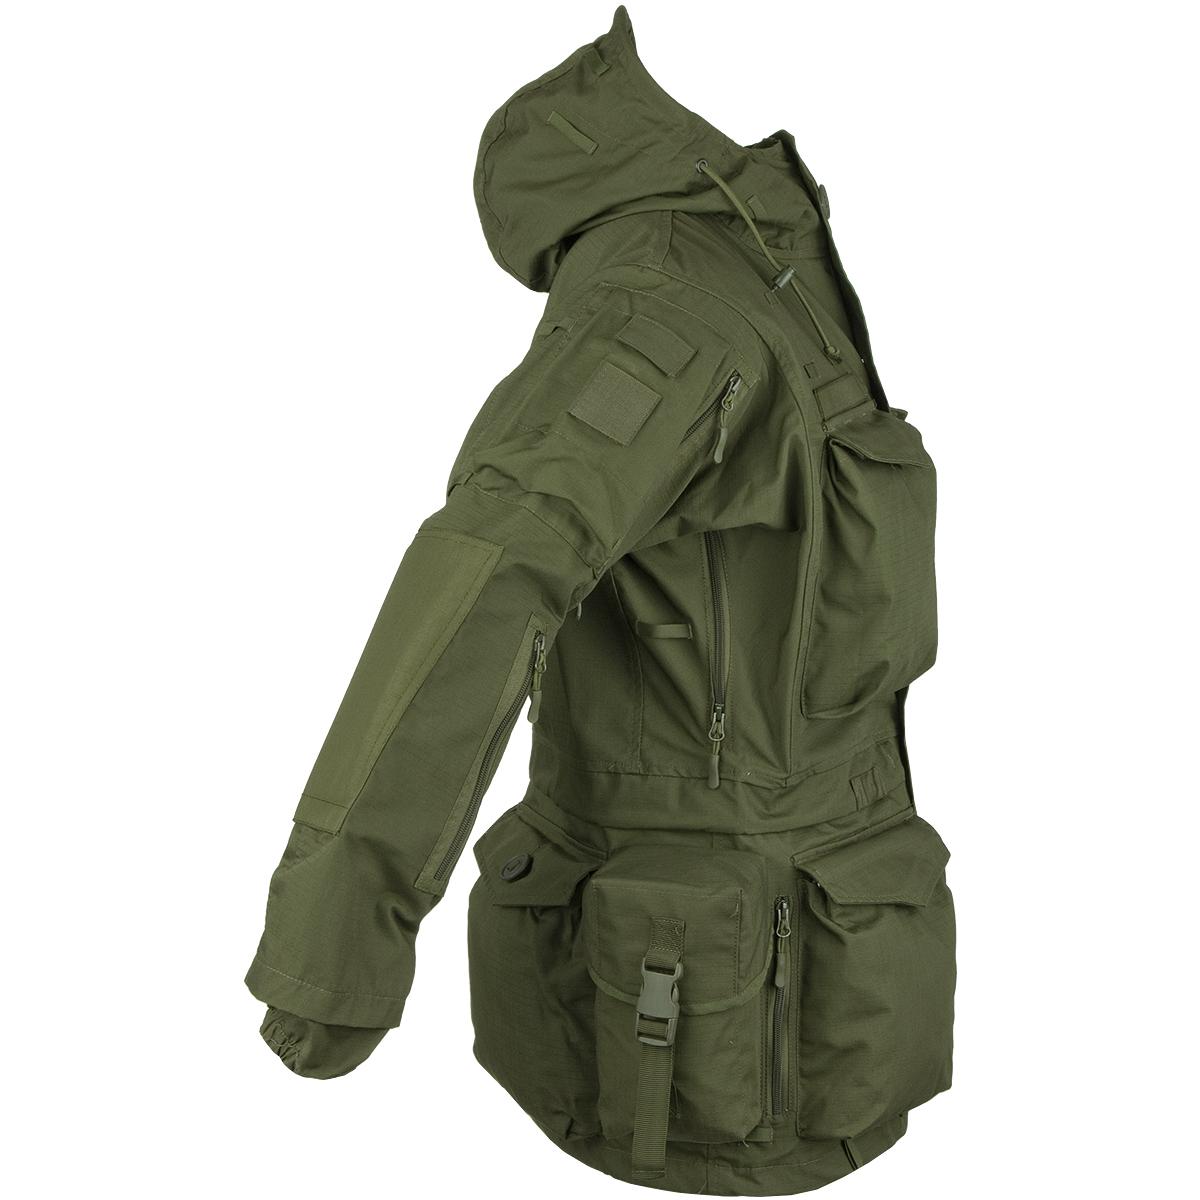 Teesar Army Smock Generation Ii Military Mens Hunting